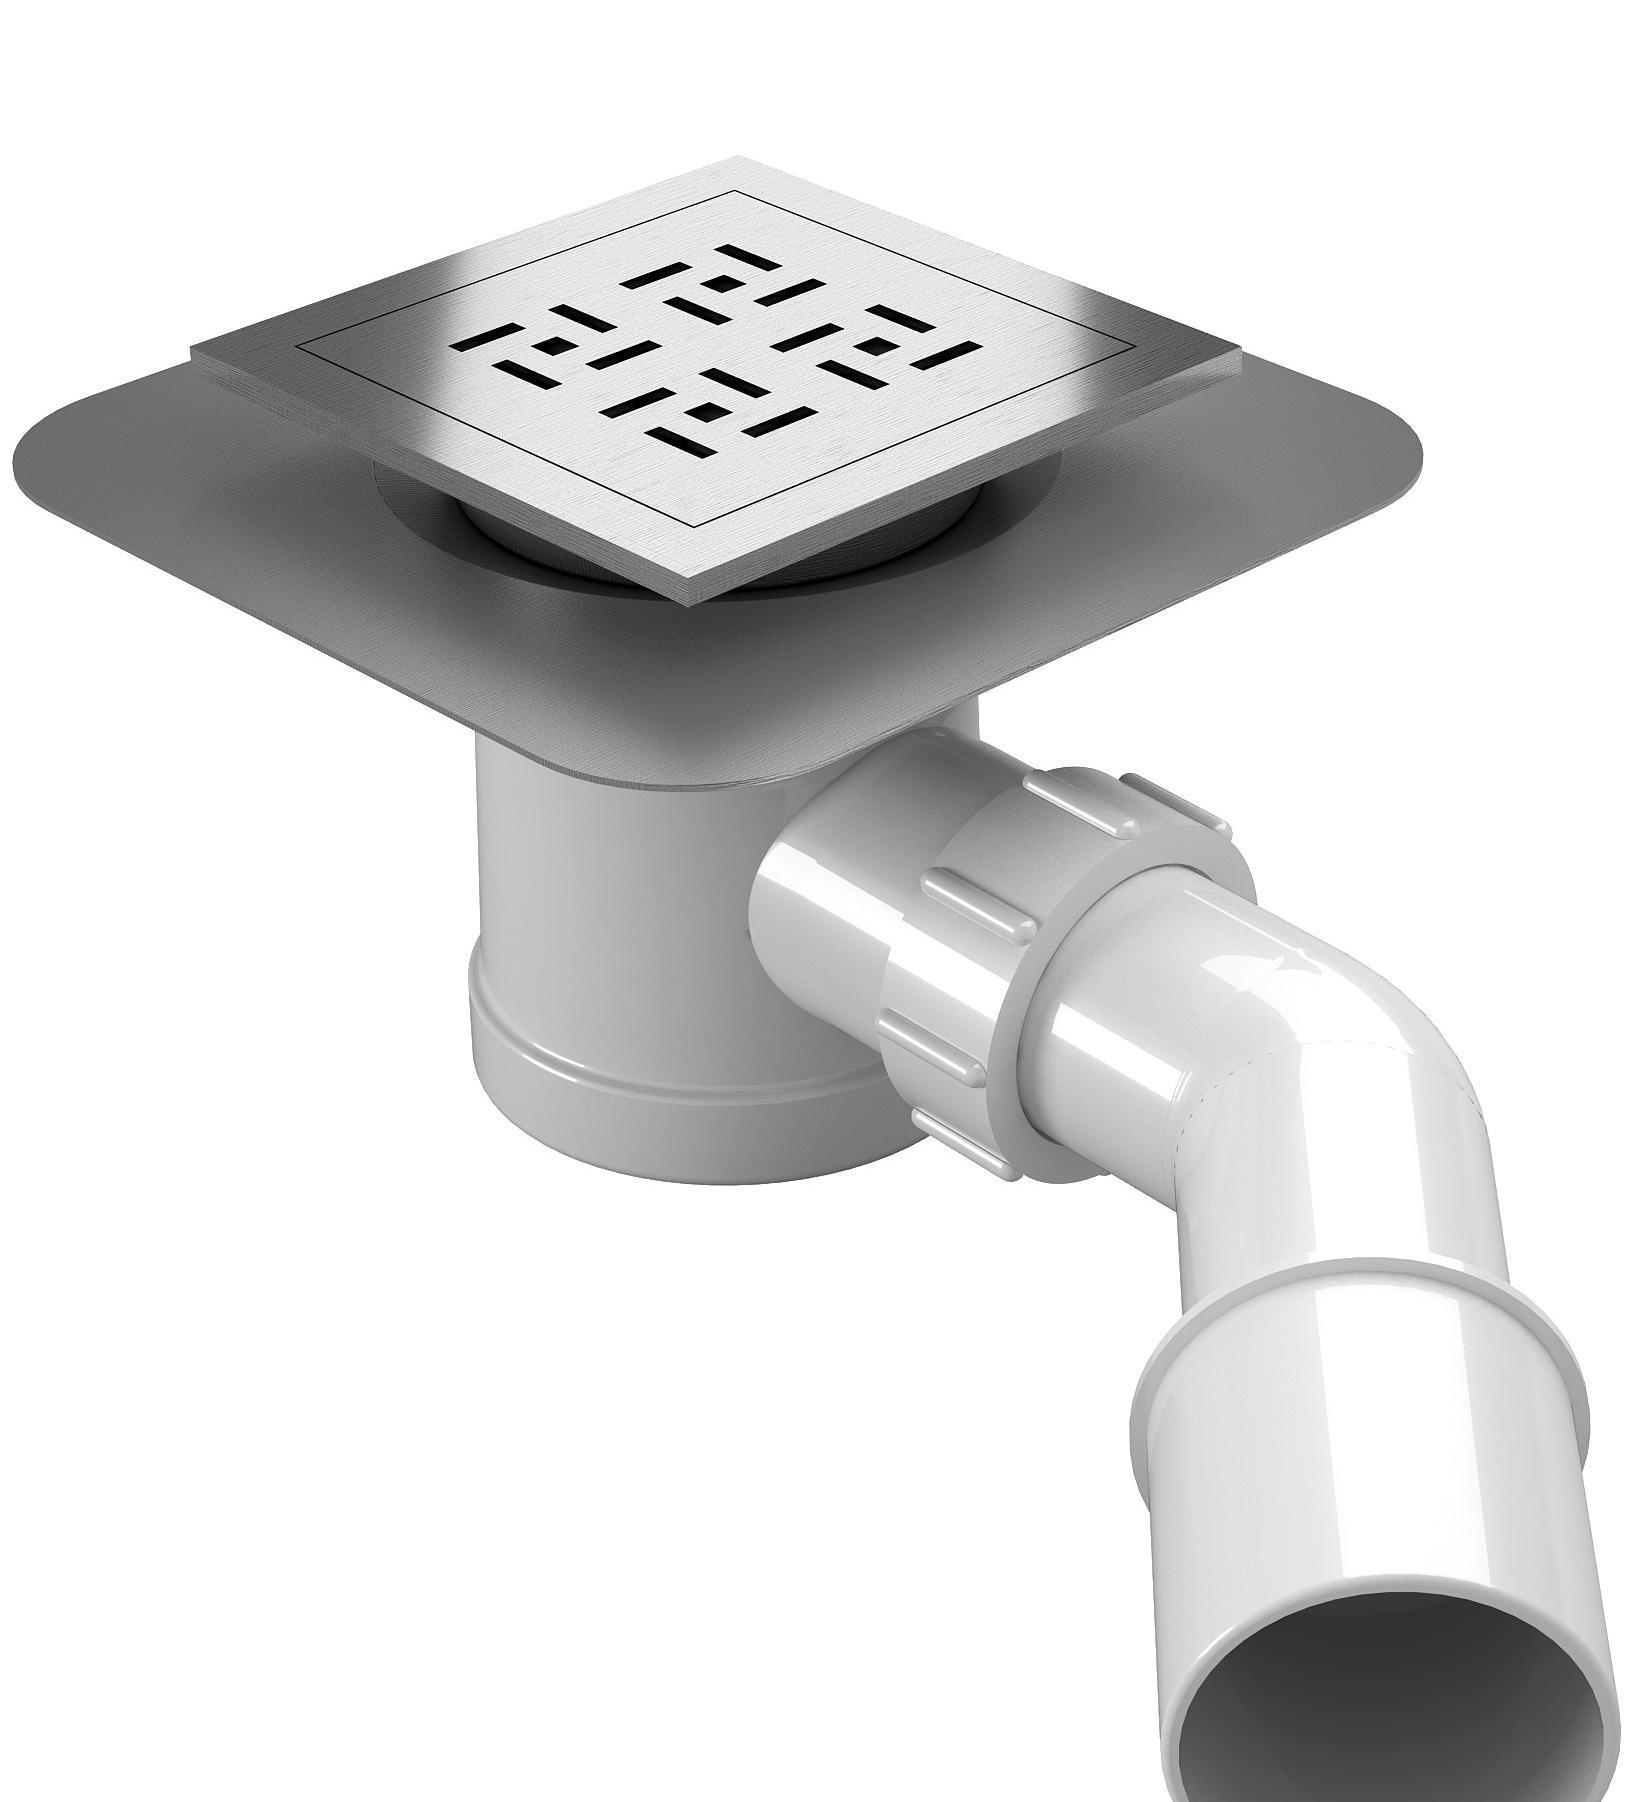 WIPER wpust Punktowy Premium 10 cm TIVANO mat